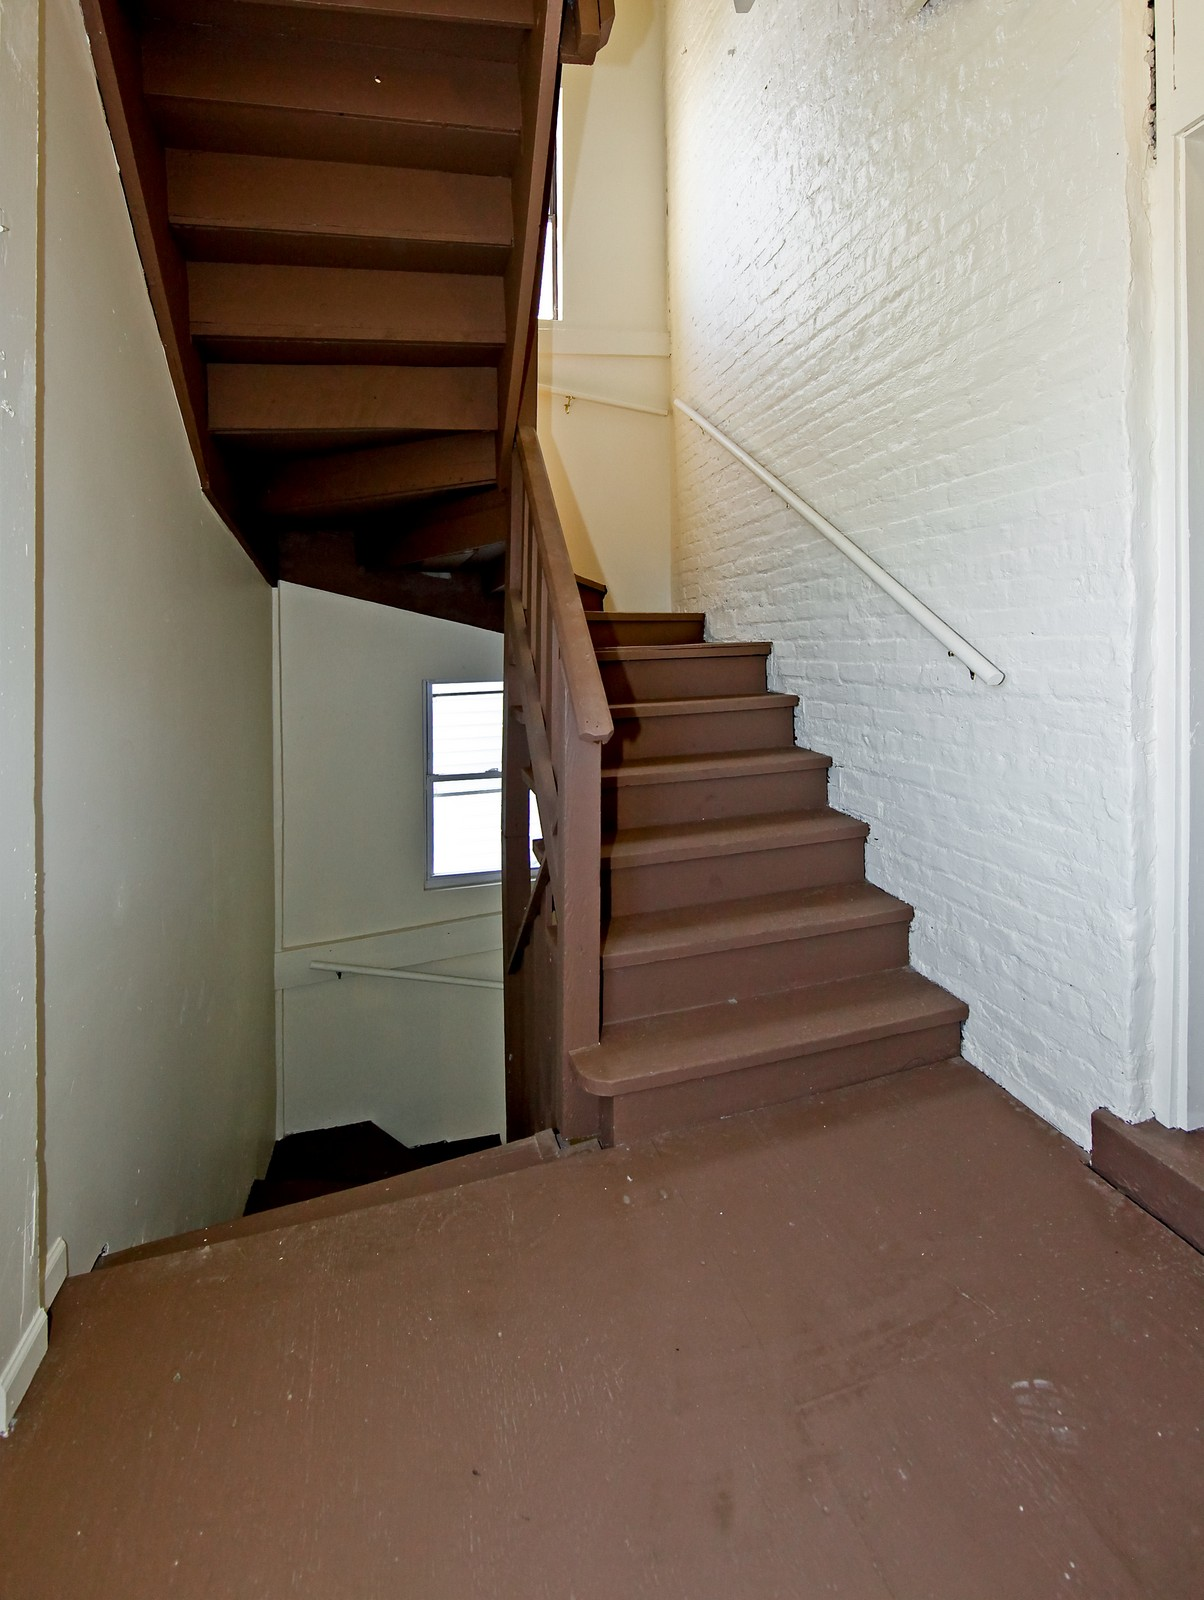 Real Estate Photography - 3332 W Polk St, Chicago, IL, 60624 - Hallway